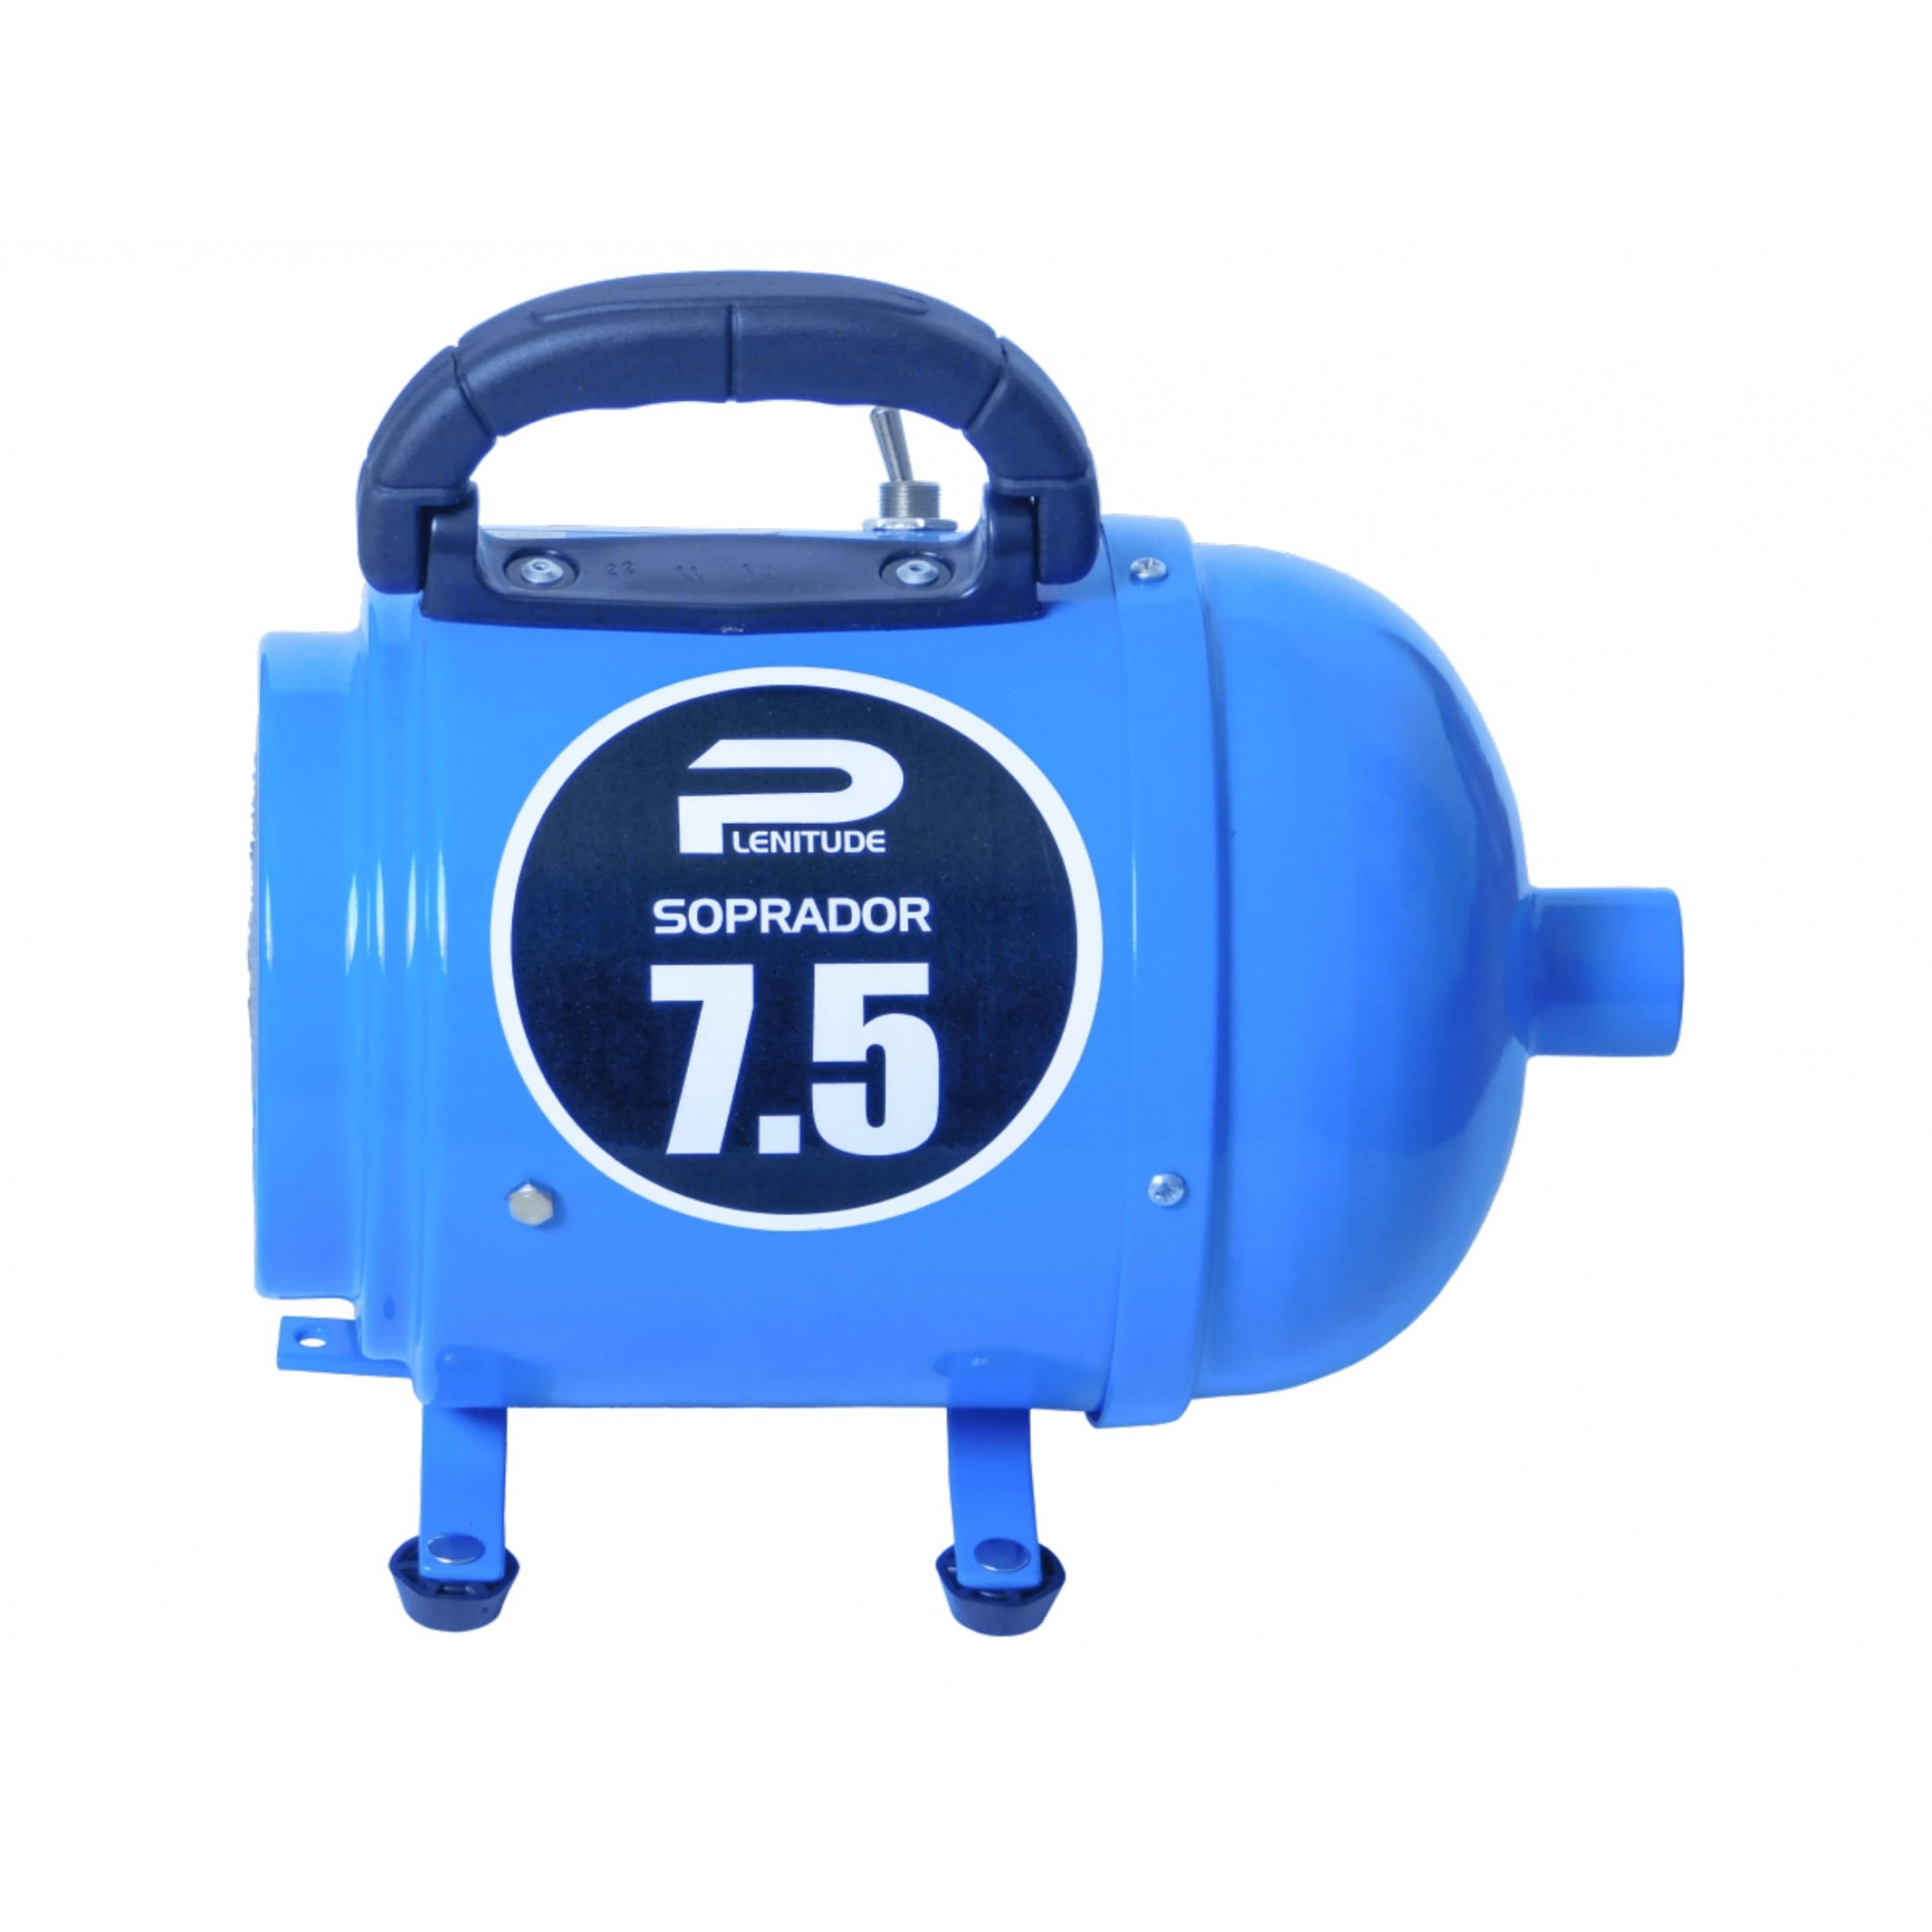 Soprador Plenitude 7.5 - 2 Velocidades - 1200W